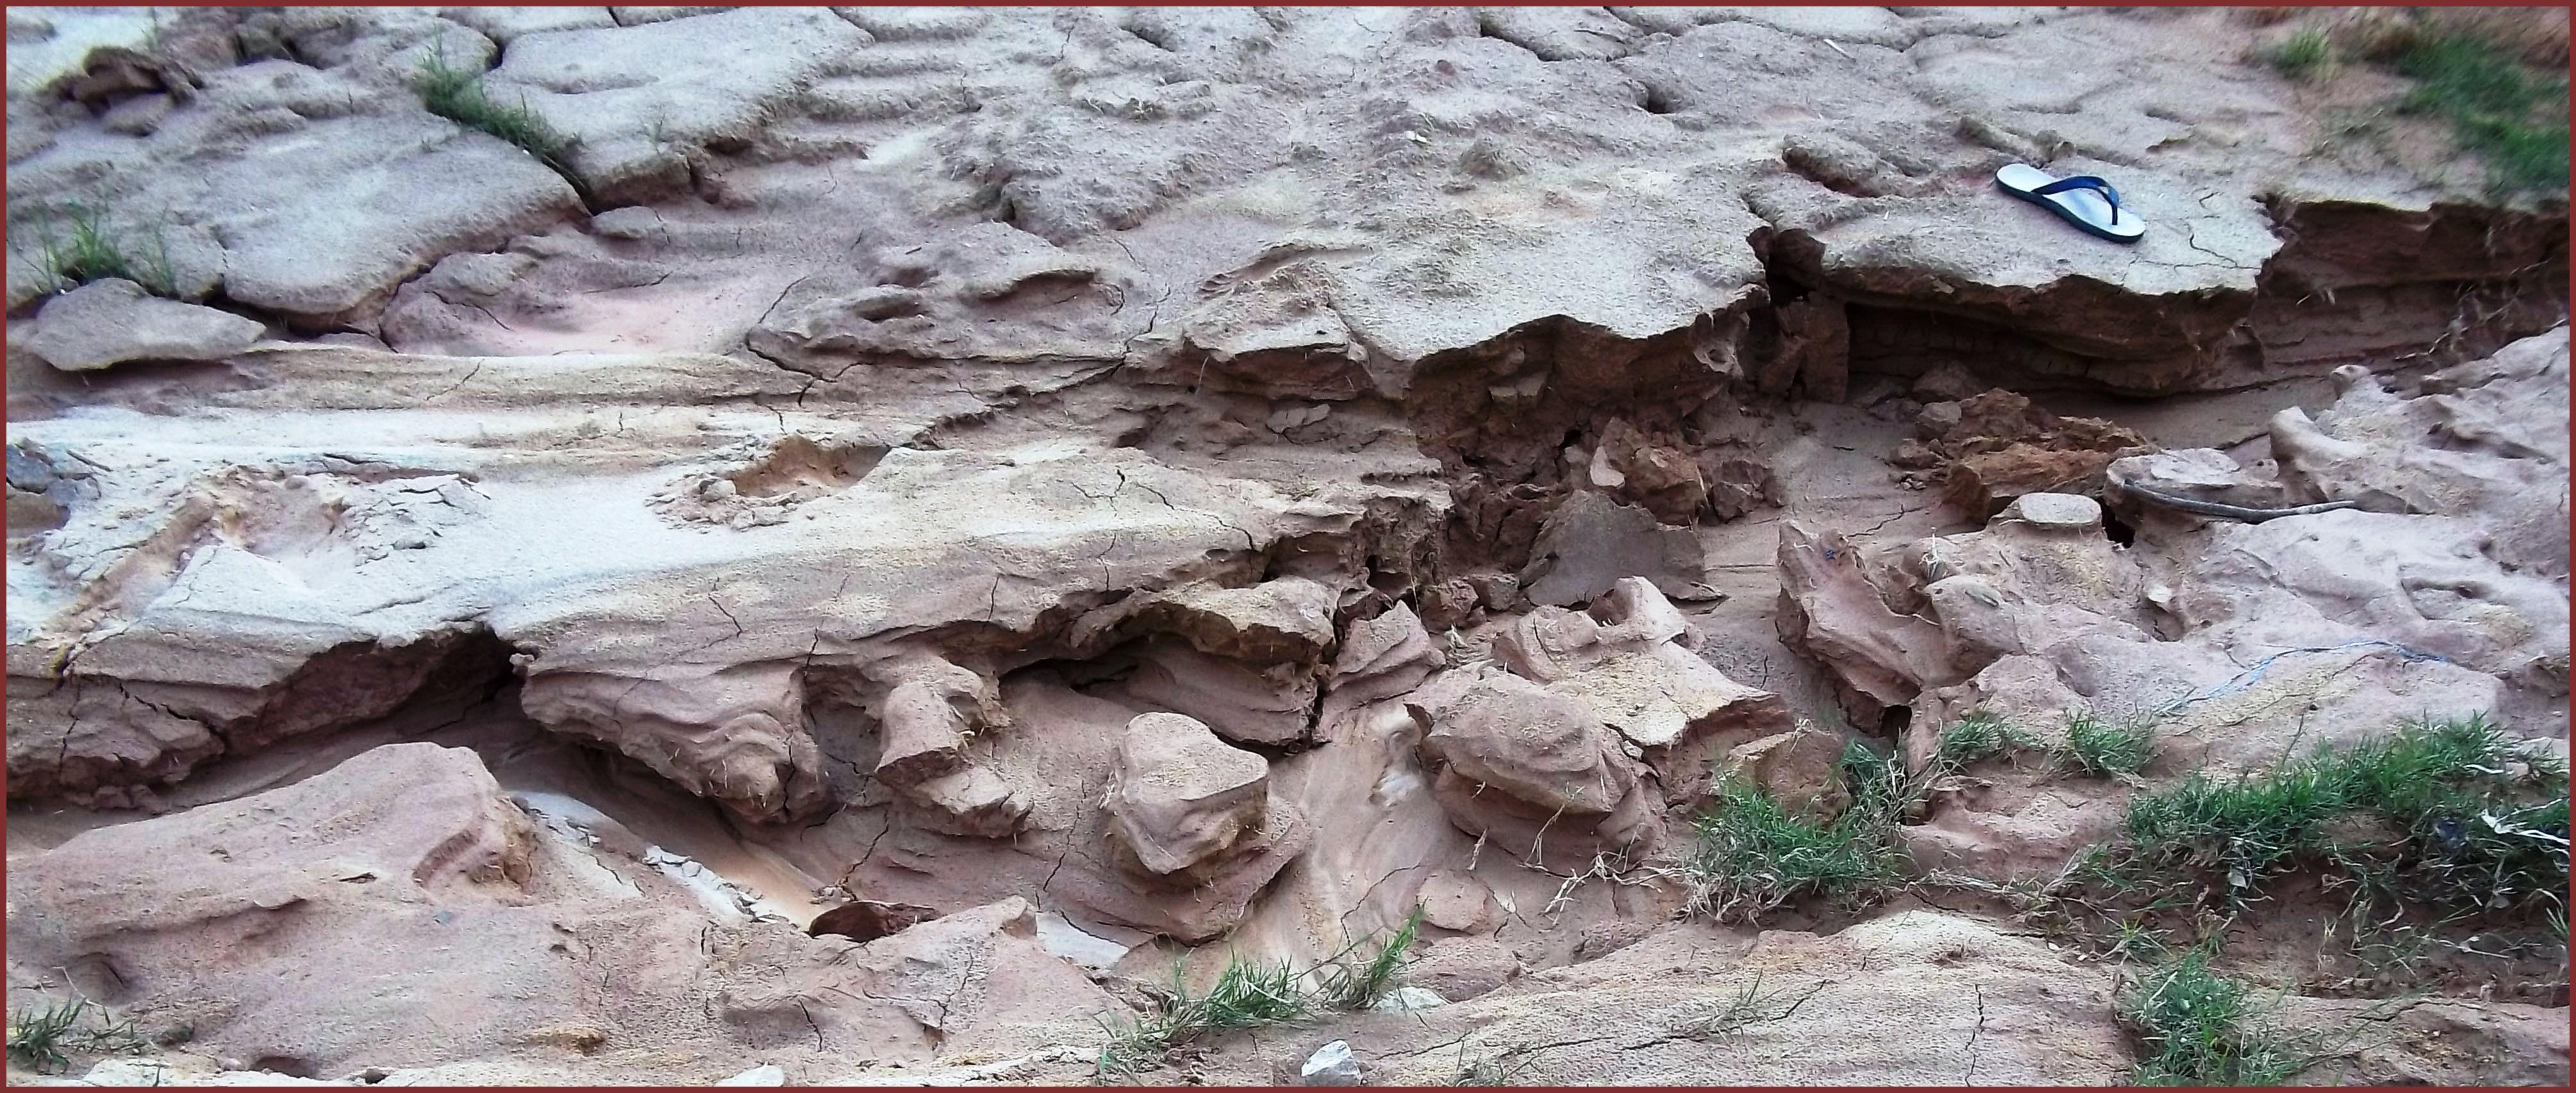 Mini-canyon3a - Copy